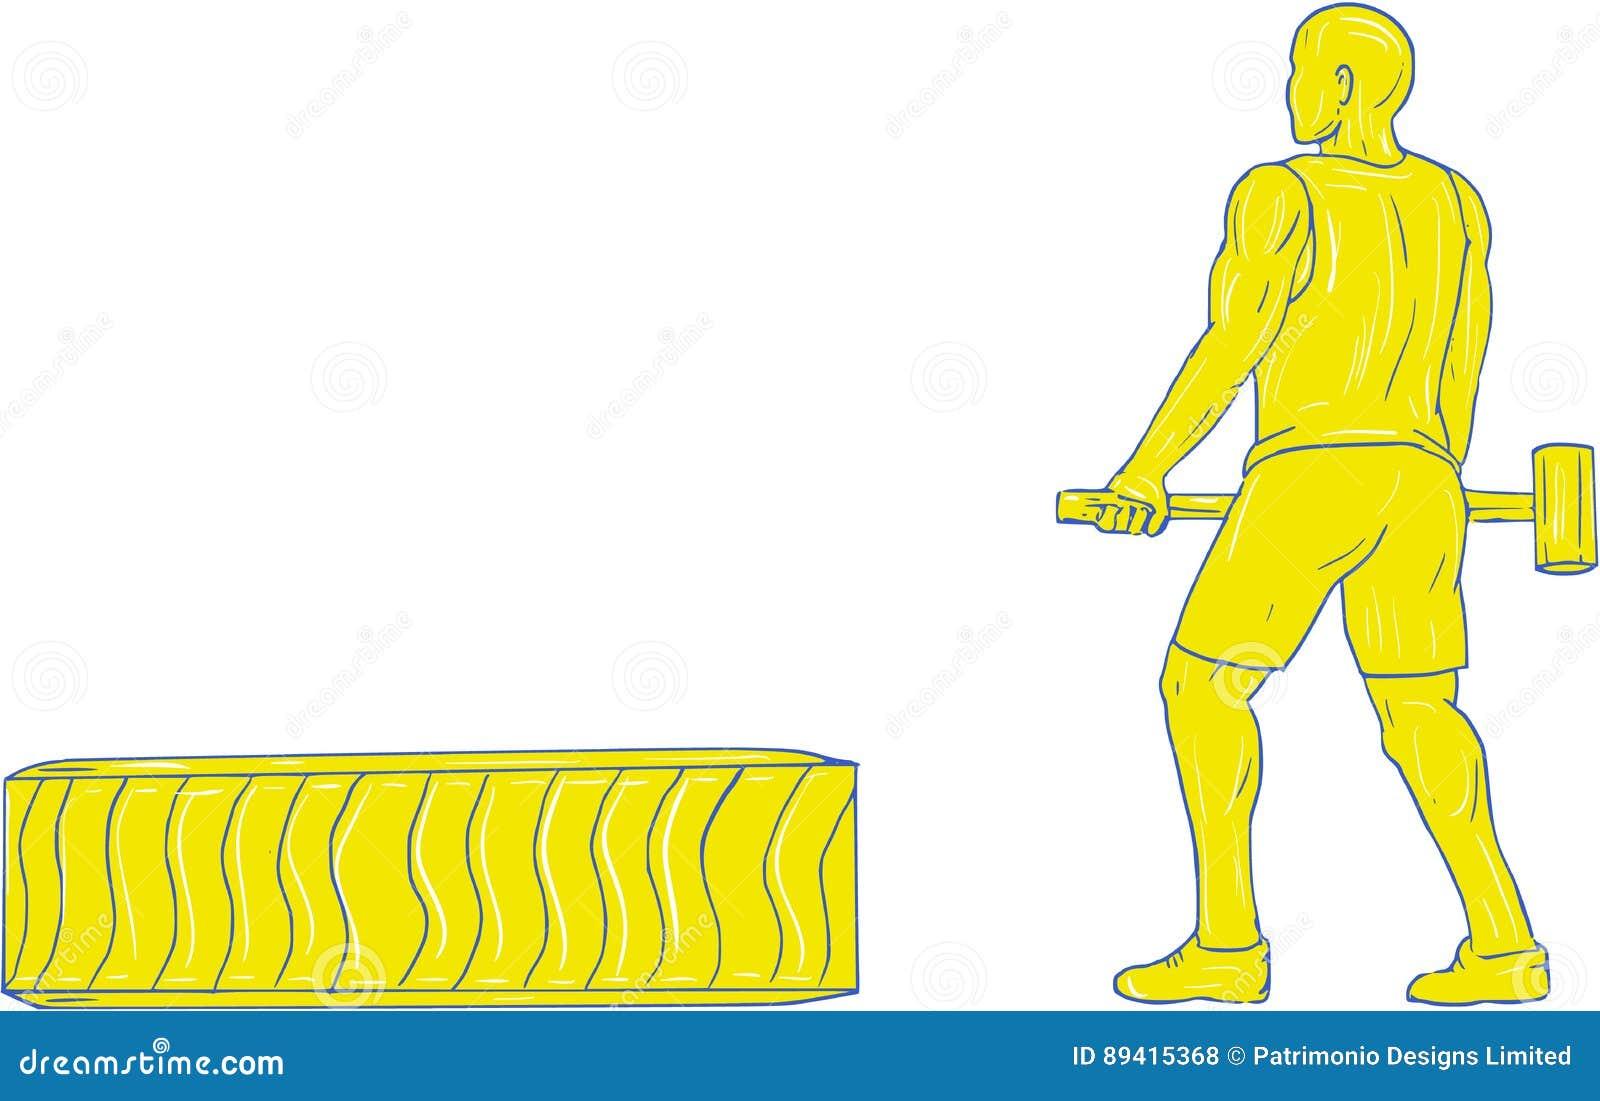 Athlète Hammer Workout Drawing de forme physique